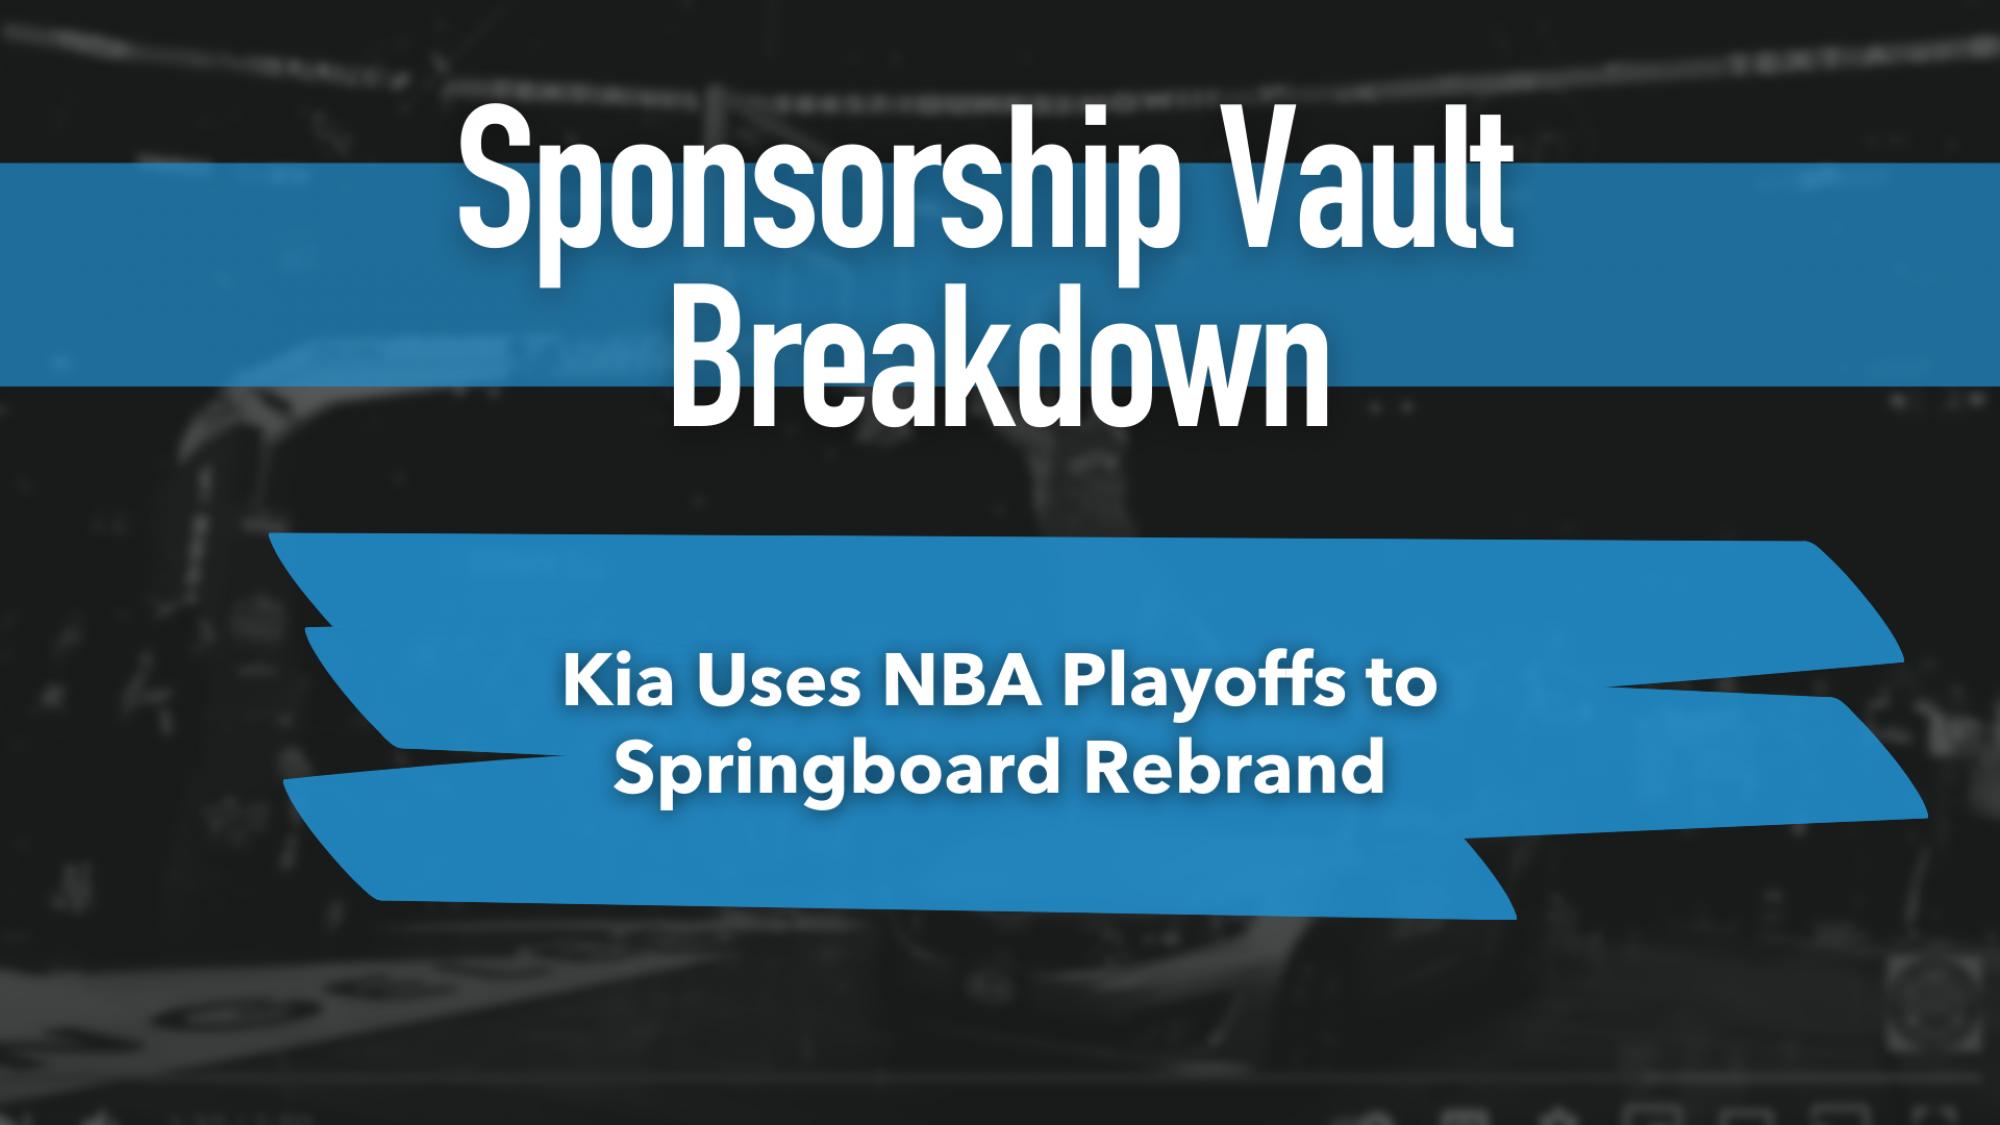 K Ia and the NBA Sponsorship 2021